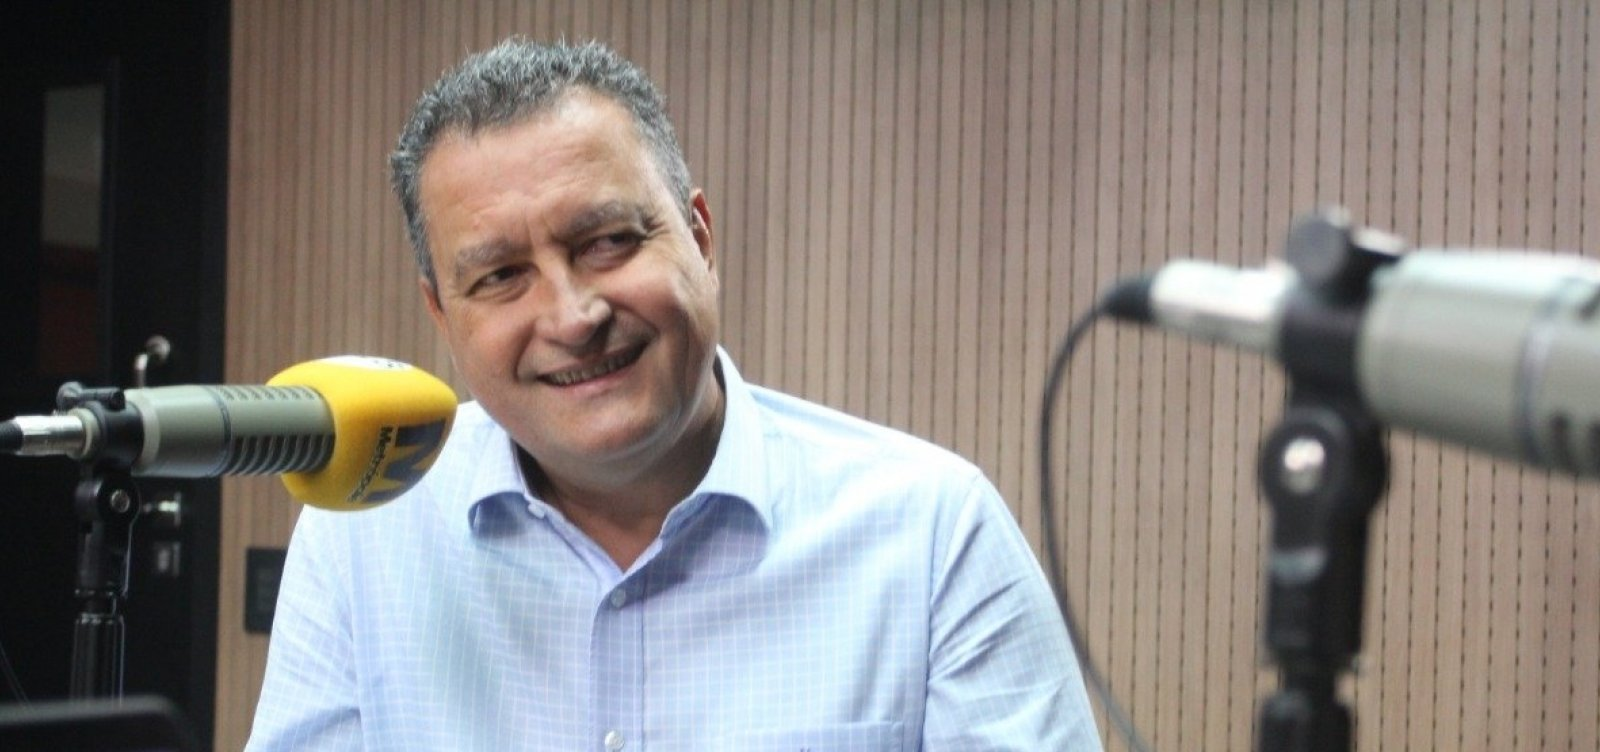 Rui Costa atinge 80% dos votos válidos, aponta Ibope